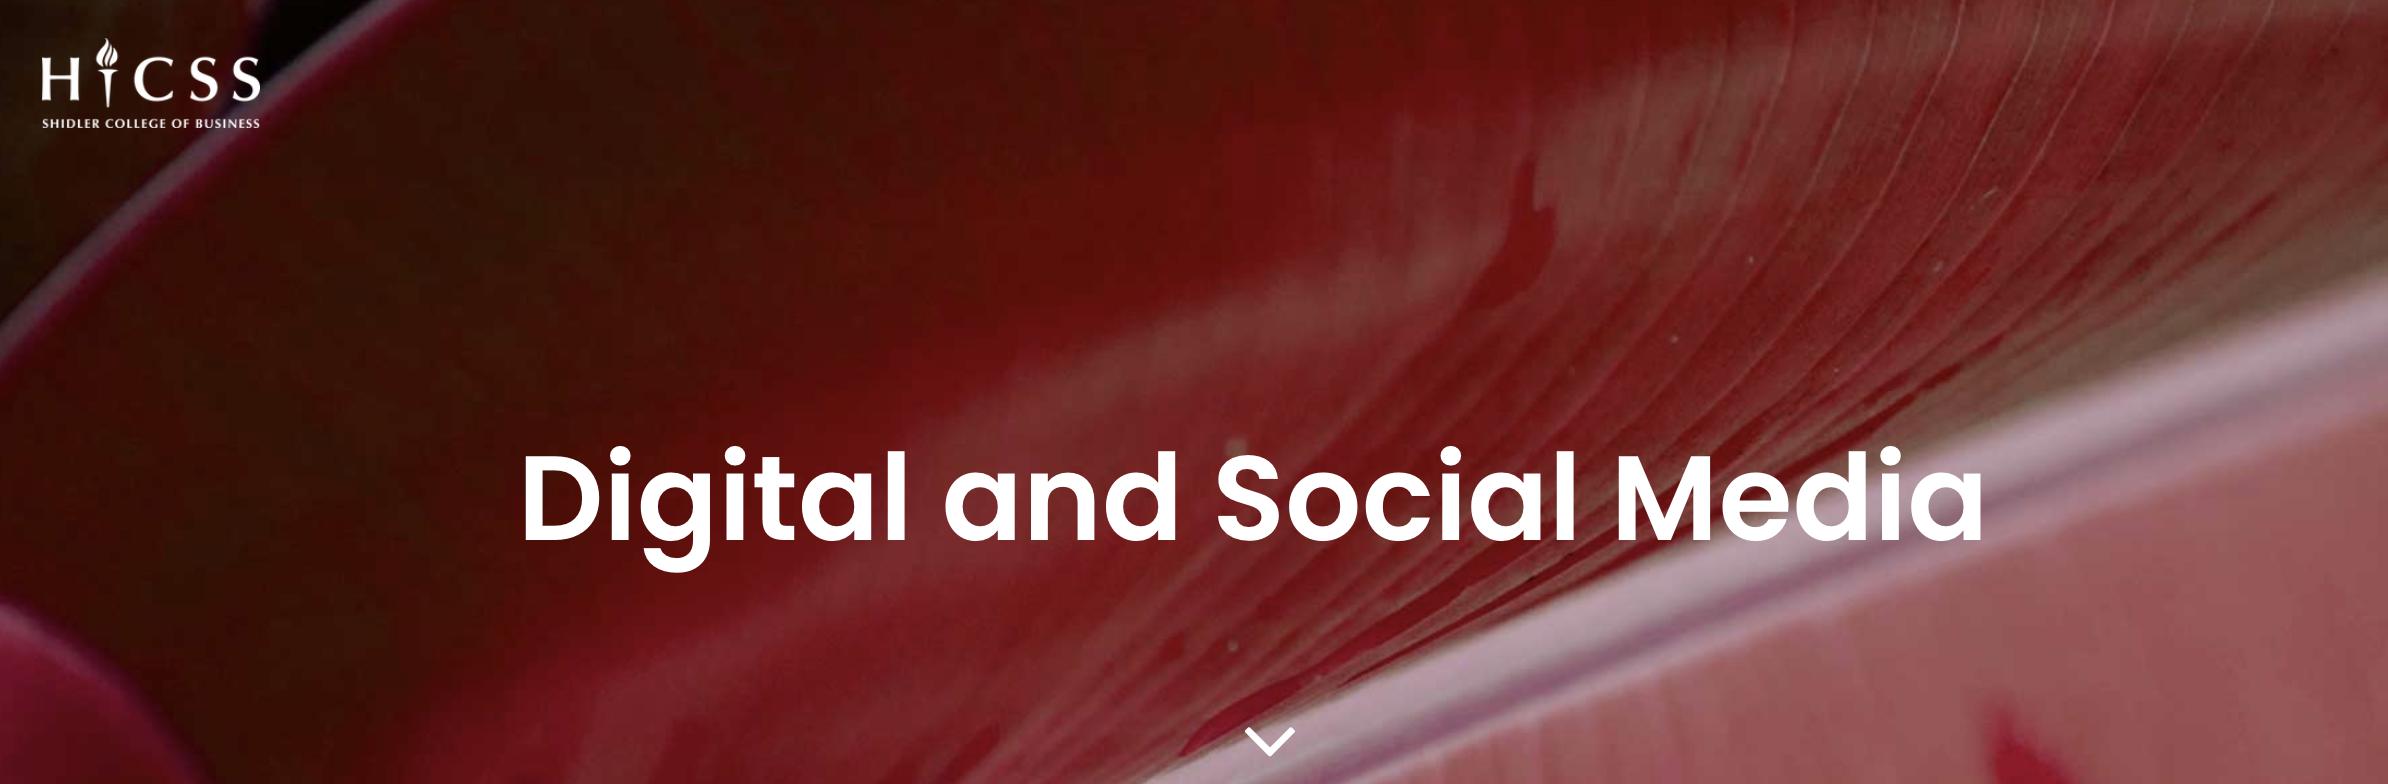 Digital and Social Media - Shidler College of Business